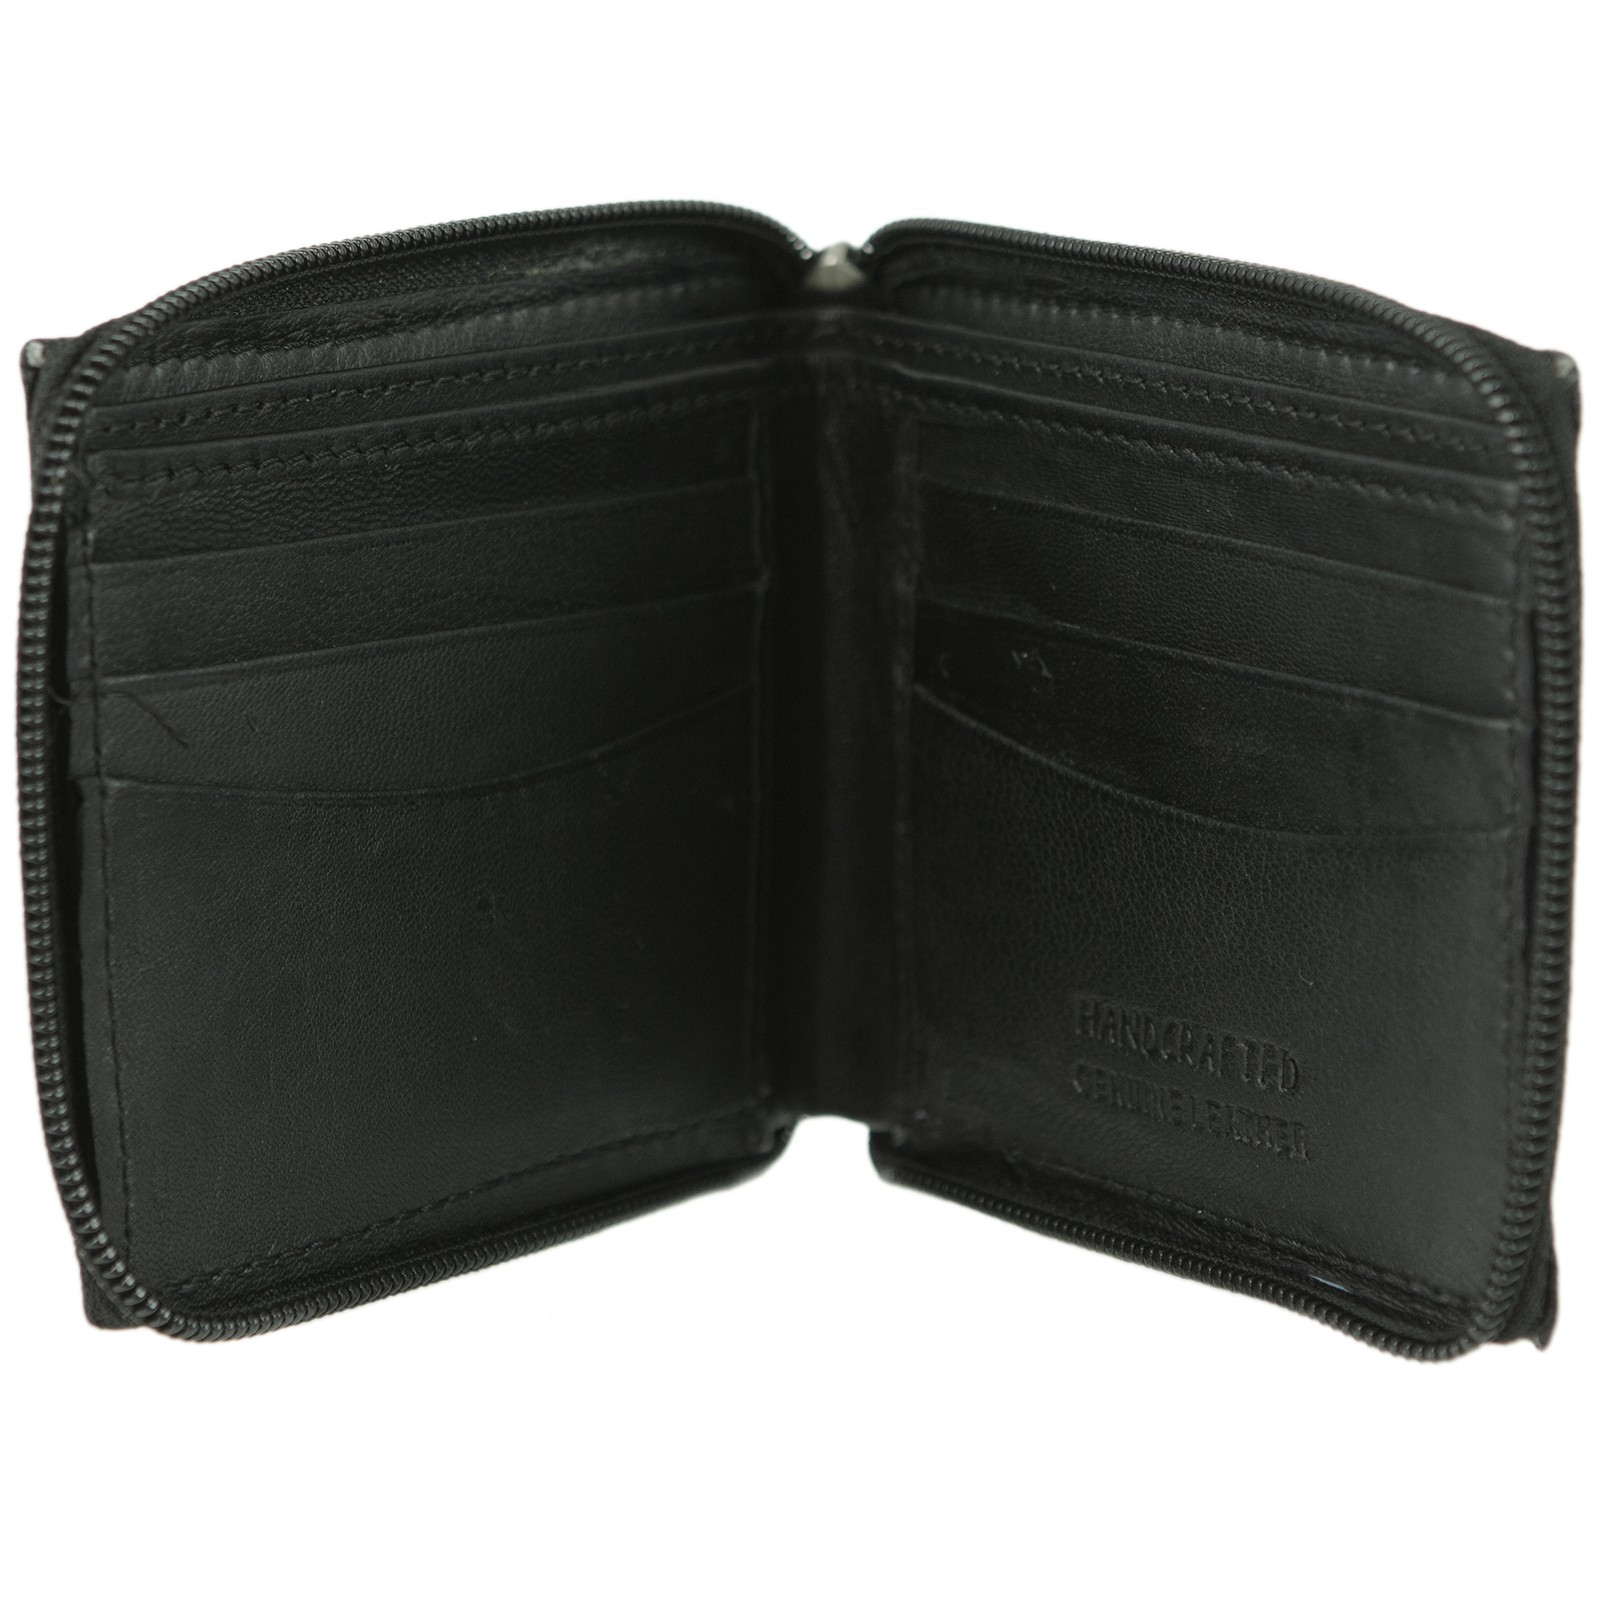 Mens Leather Wallet Bifold Zip Around ID Credit Card Case Billfold Great Value